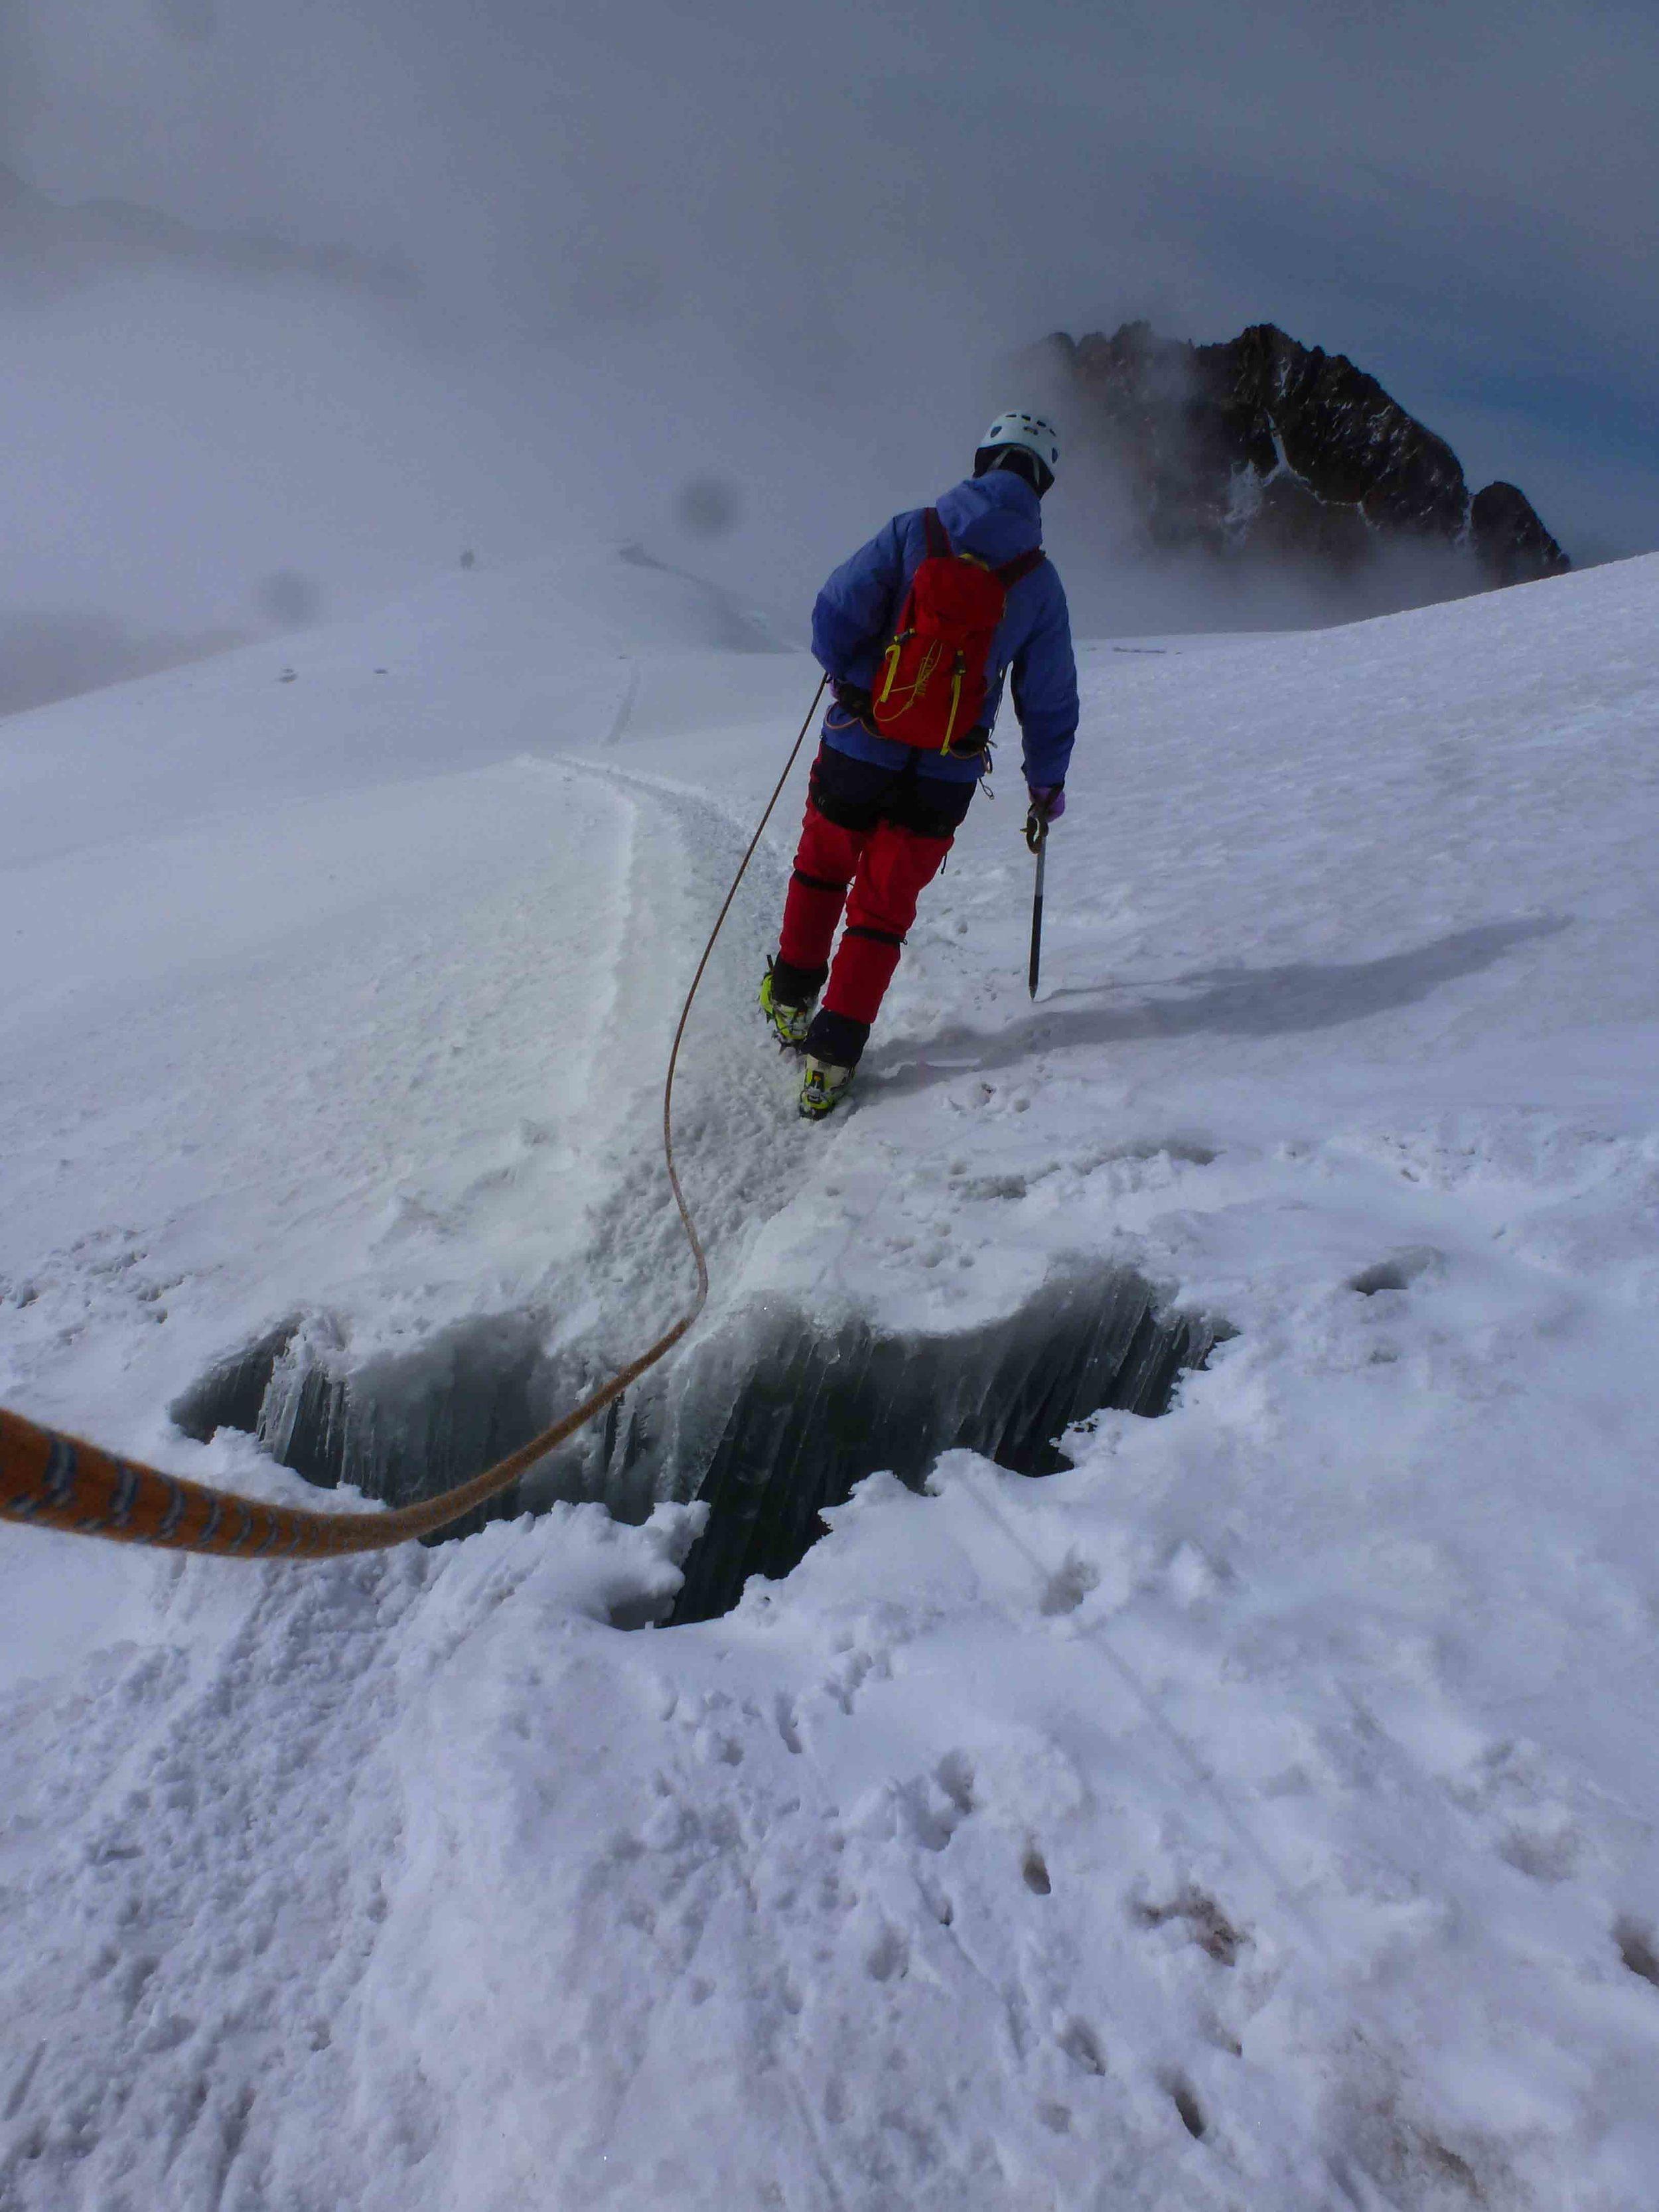 2015_12_S_LaPaz_IceClimbing-11.jpg